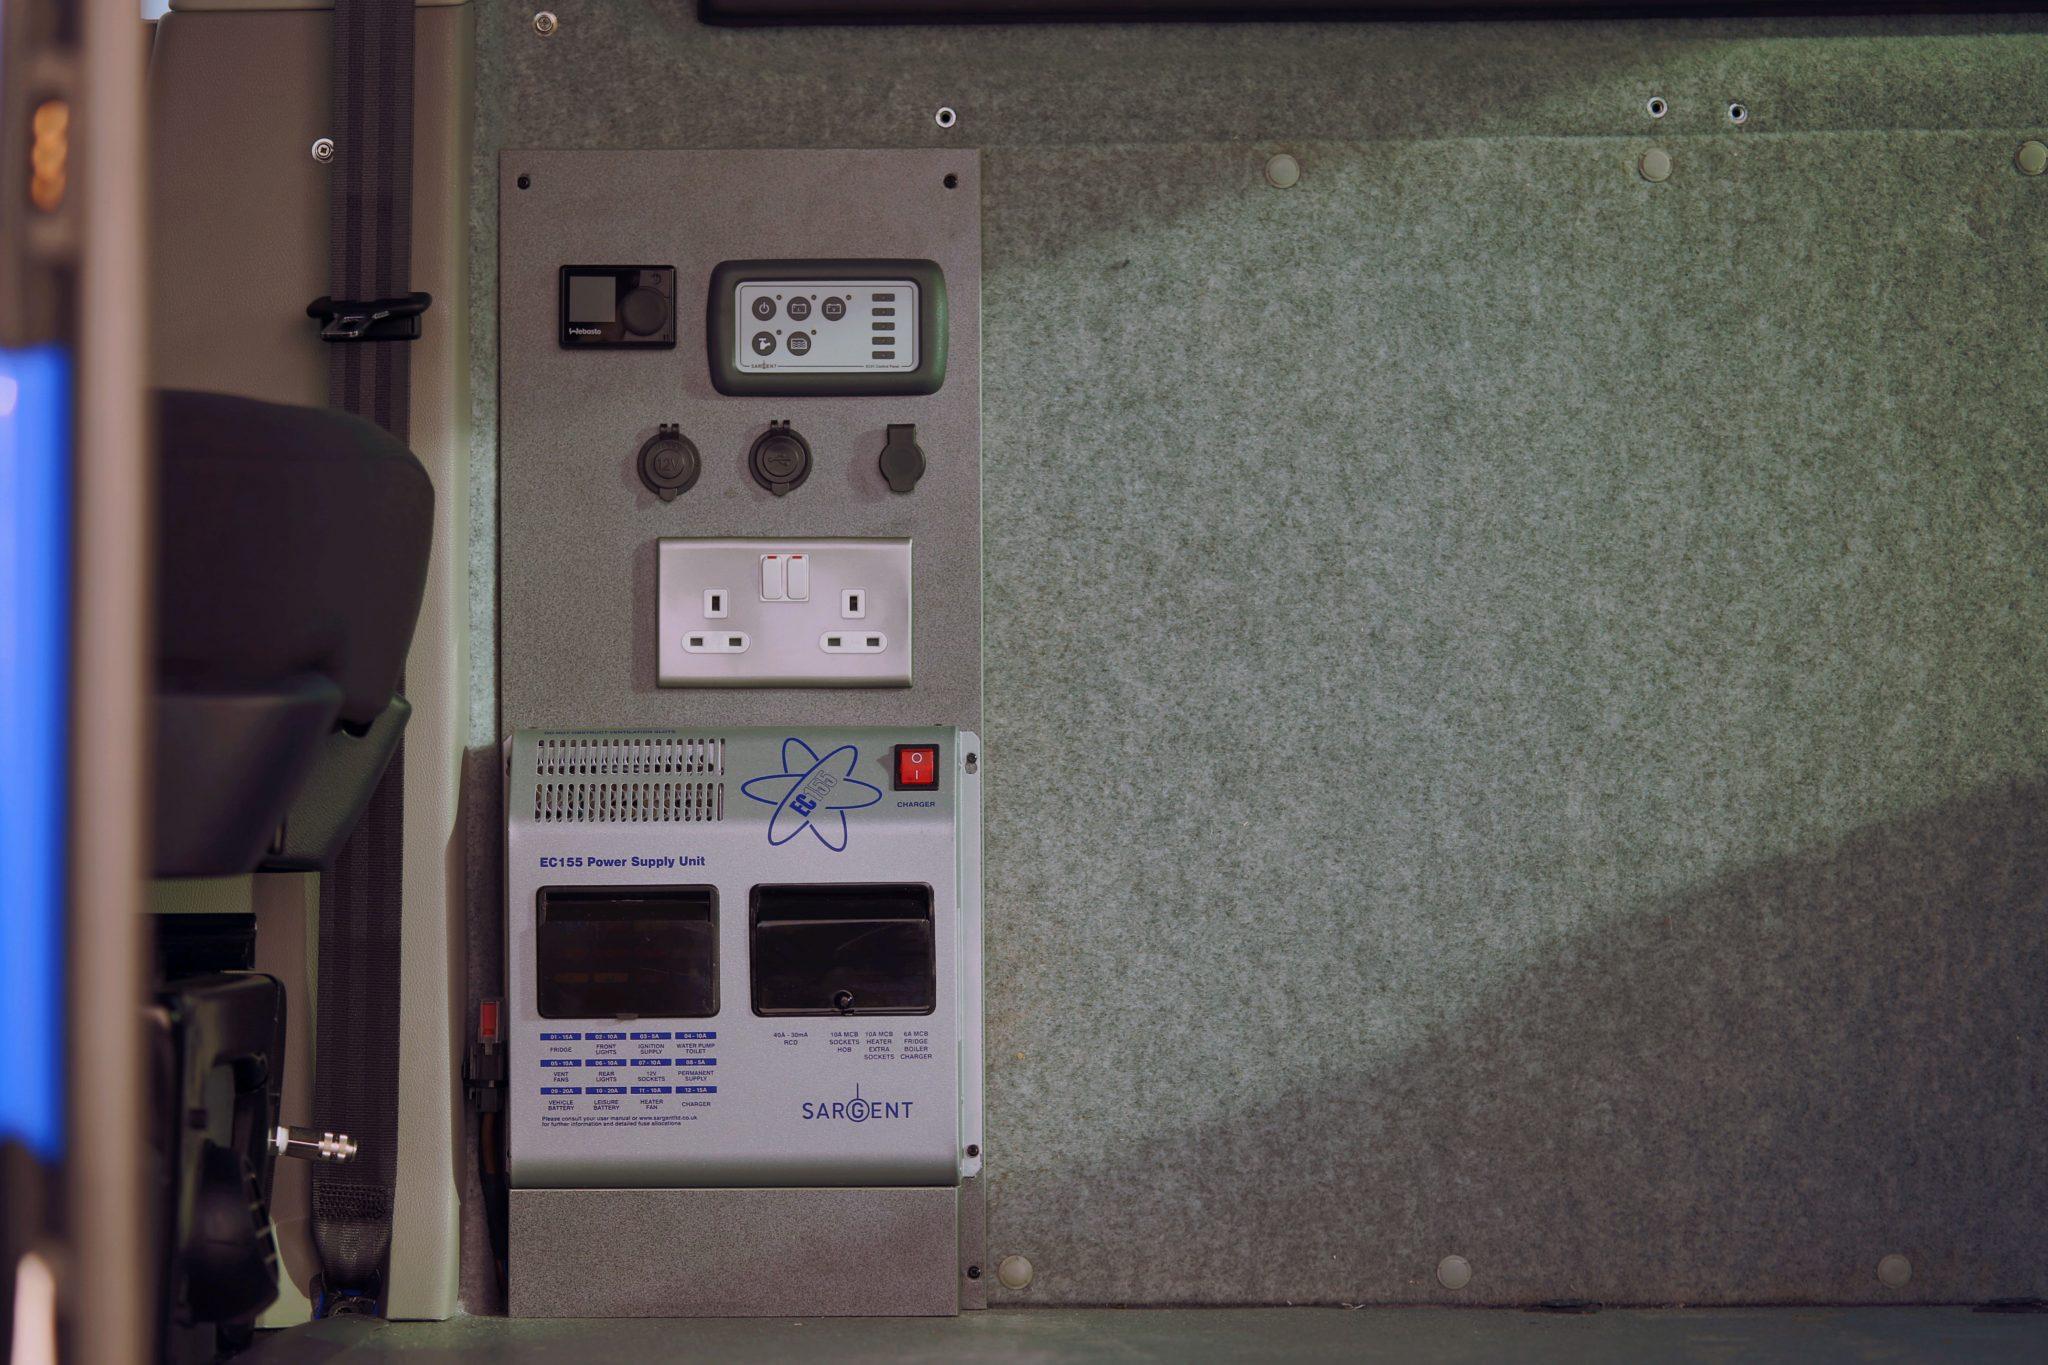 Sargent-control-panel